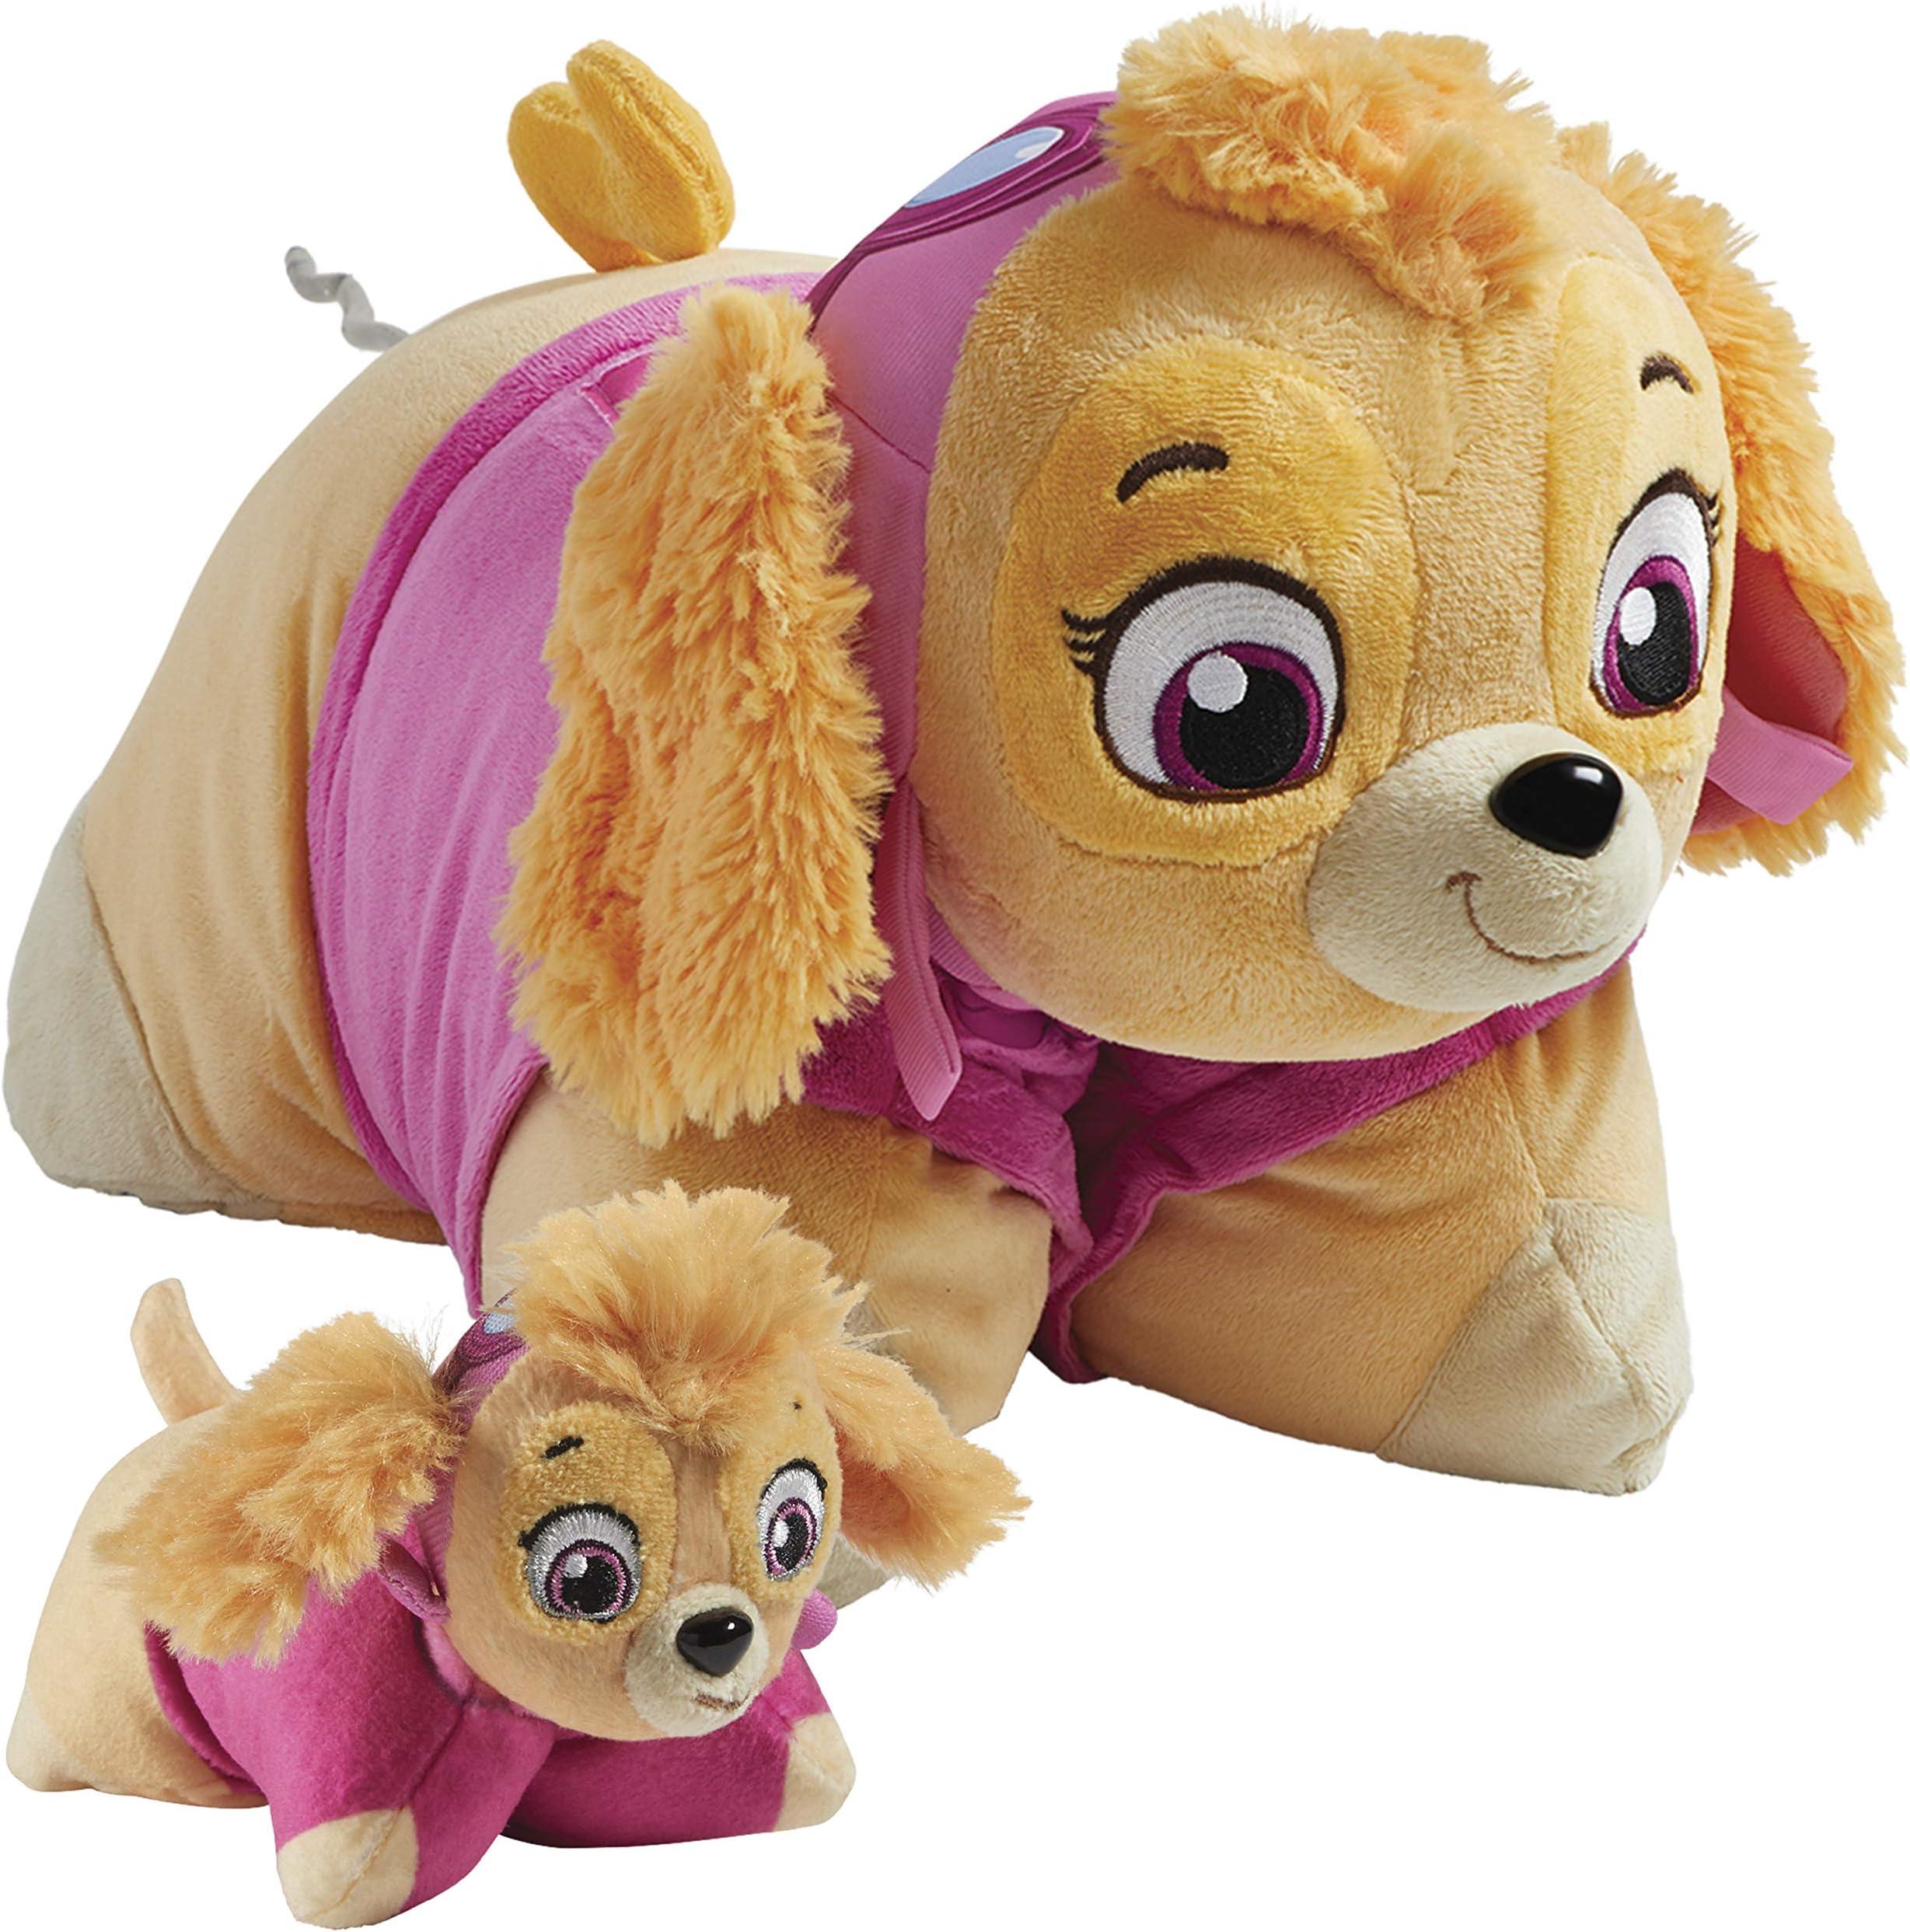 Pillow Pets Nickelodeon Paw Patrol Skye Stuffed Animal Plush Toy